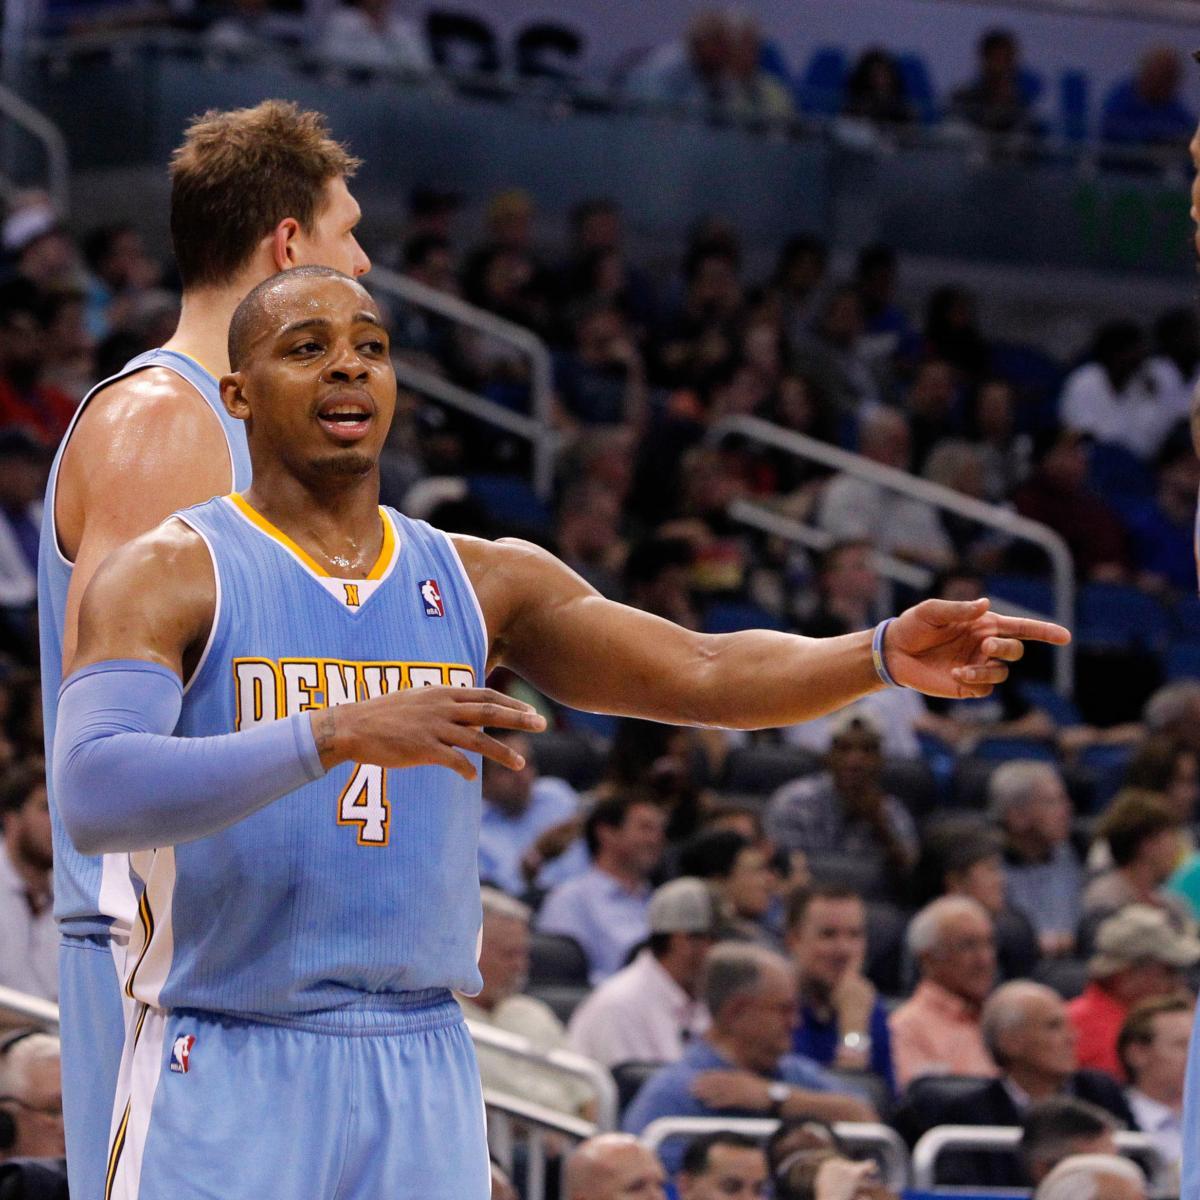 Denver Nuggets 2014 NBA Free Agency Big Board: Ranking Top